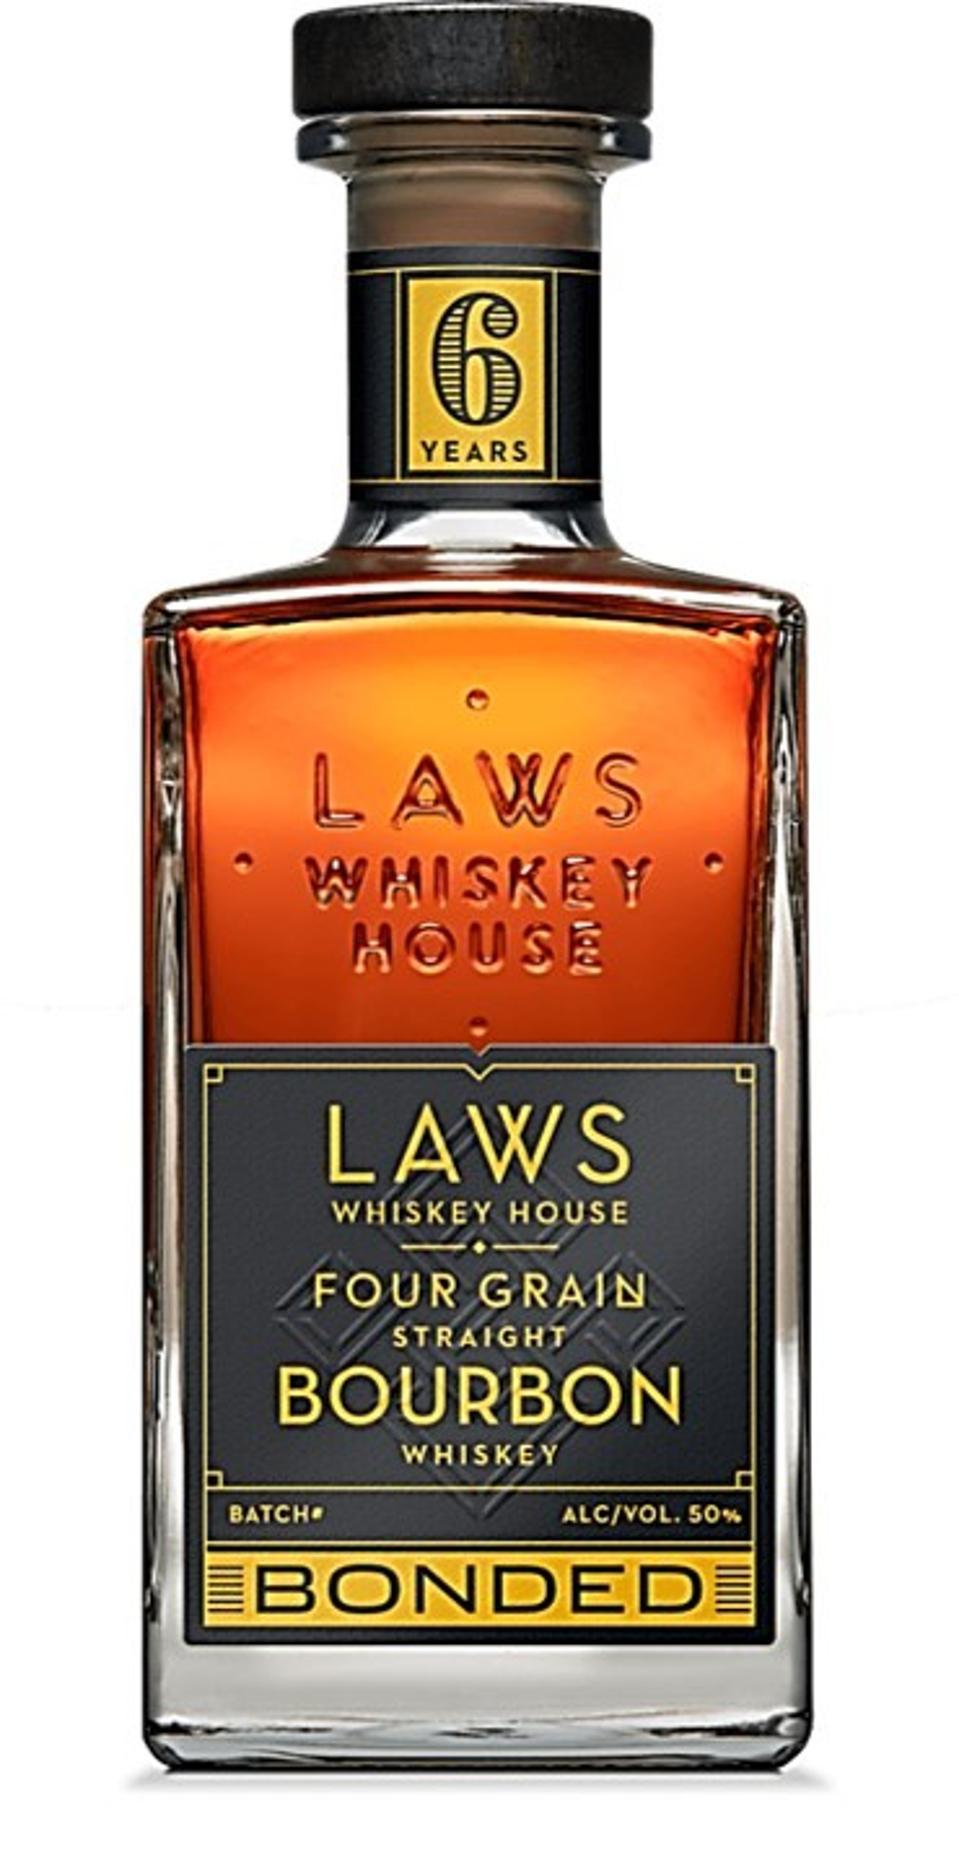 Laws Whiskey, Bonded Four Grain Straight Bourbon Whiskey